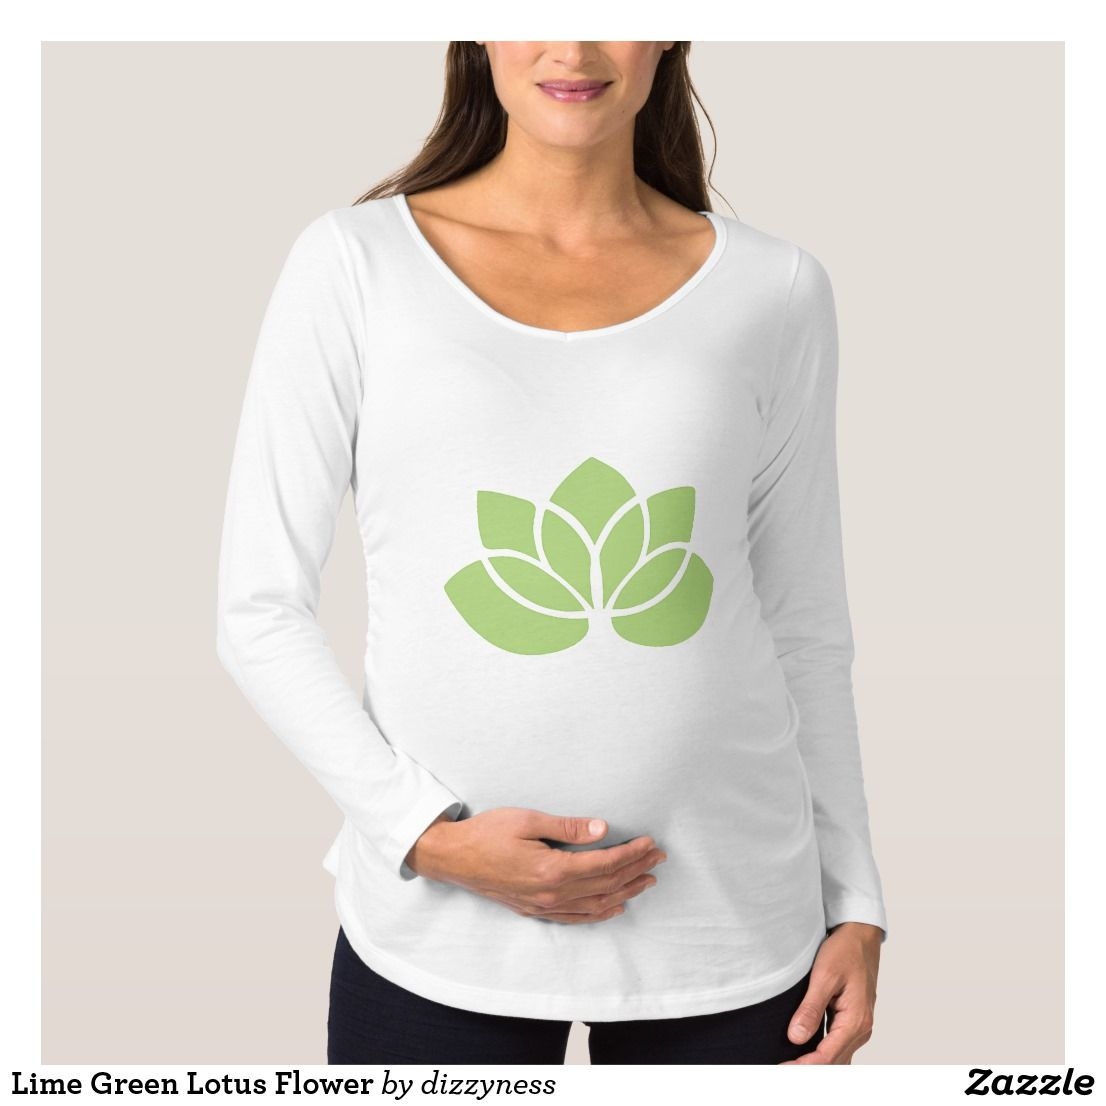 Lime green lotus flower t shirt izmirmasajfo Images